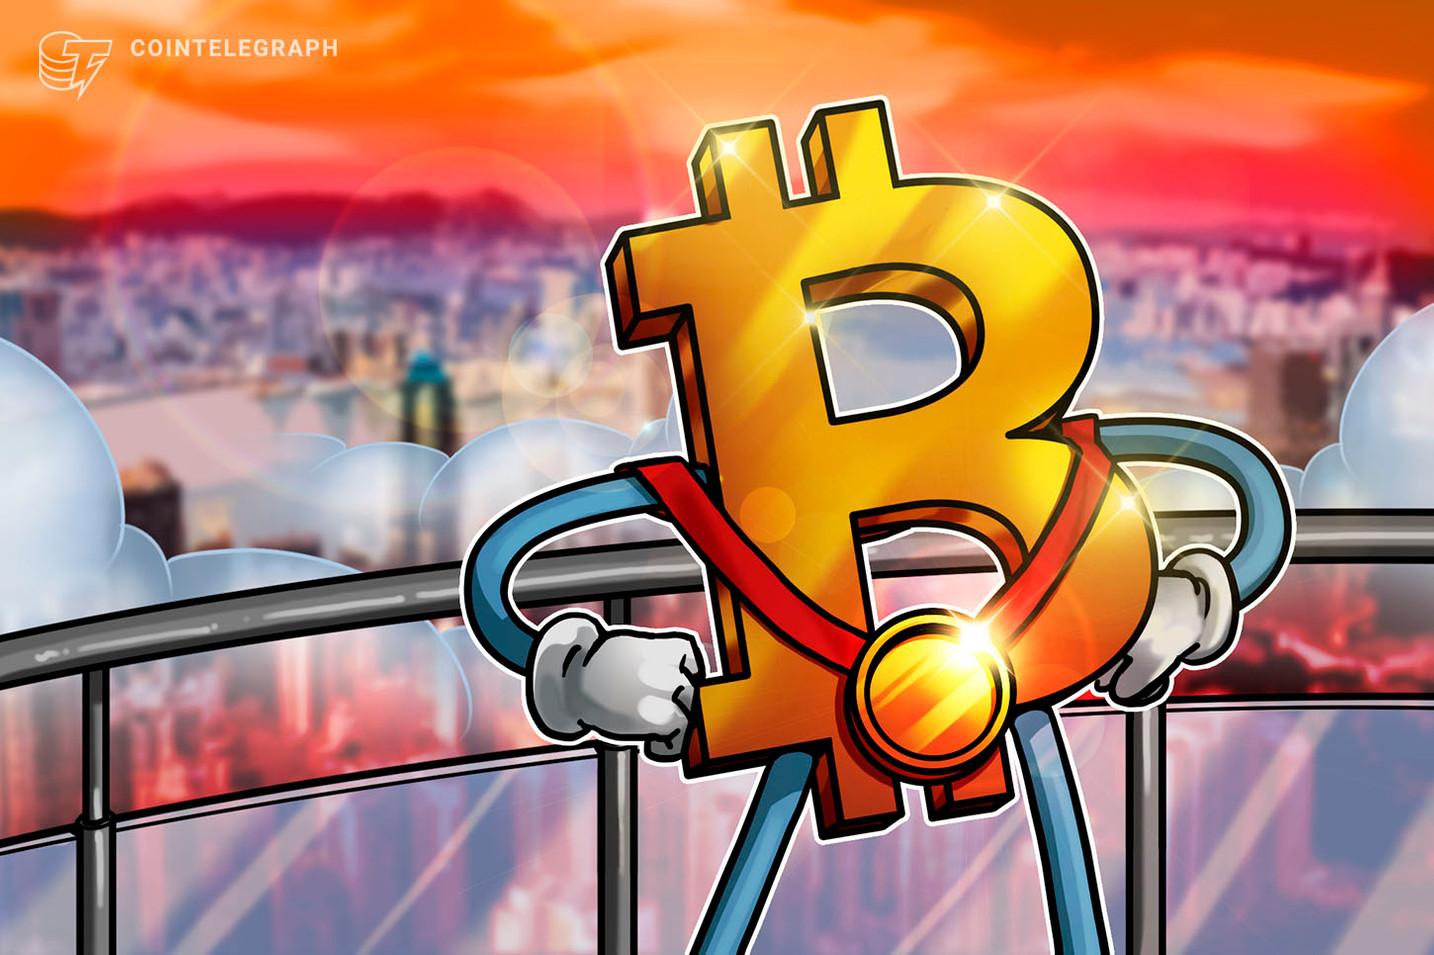 Hong Kong's BTC association pushes 'Bitcoin Tram' ad campaign